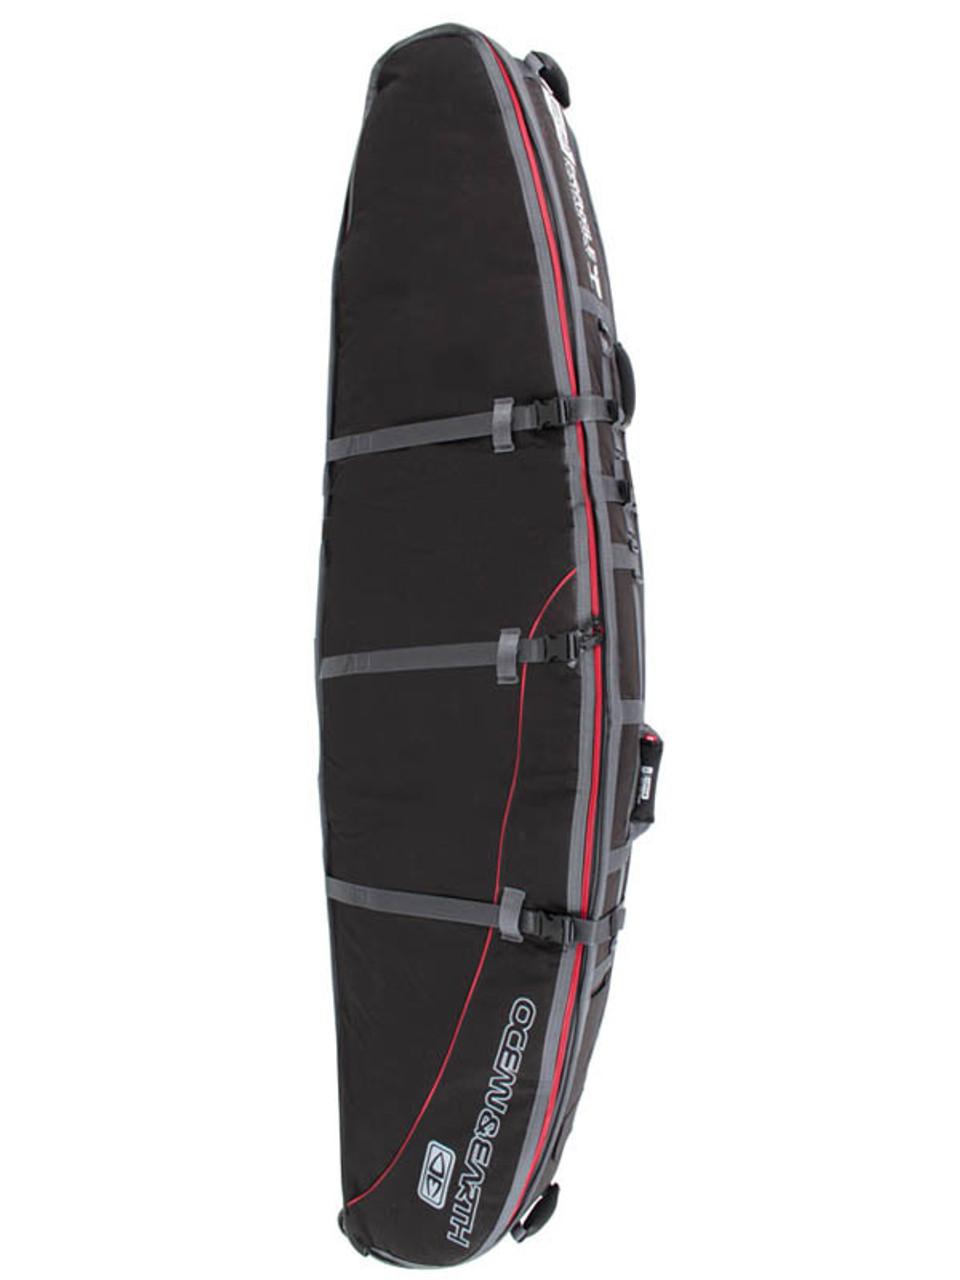 longboard surfboard travel bag with wheels